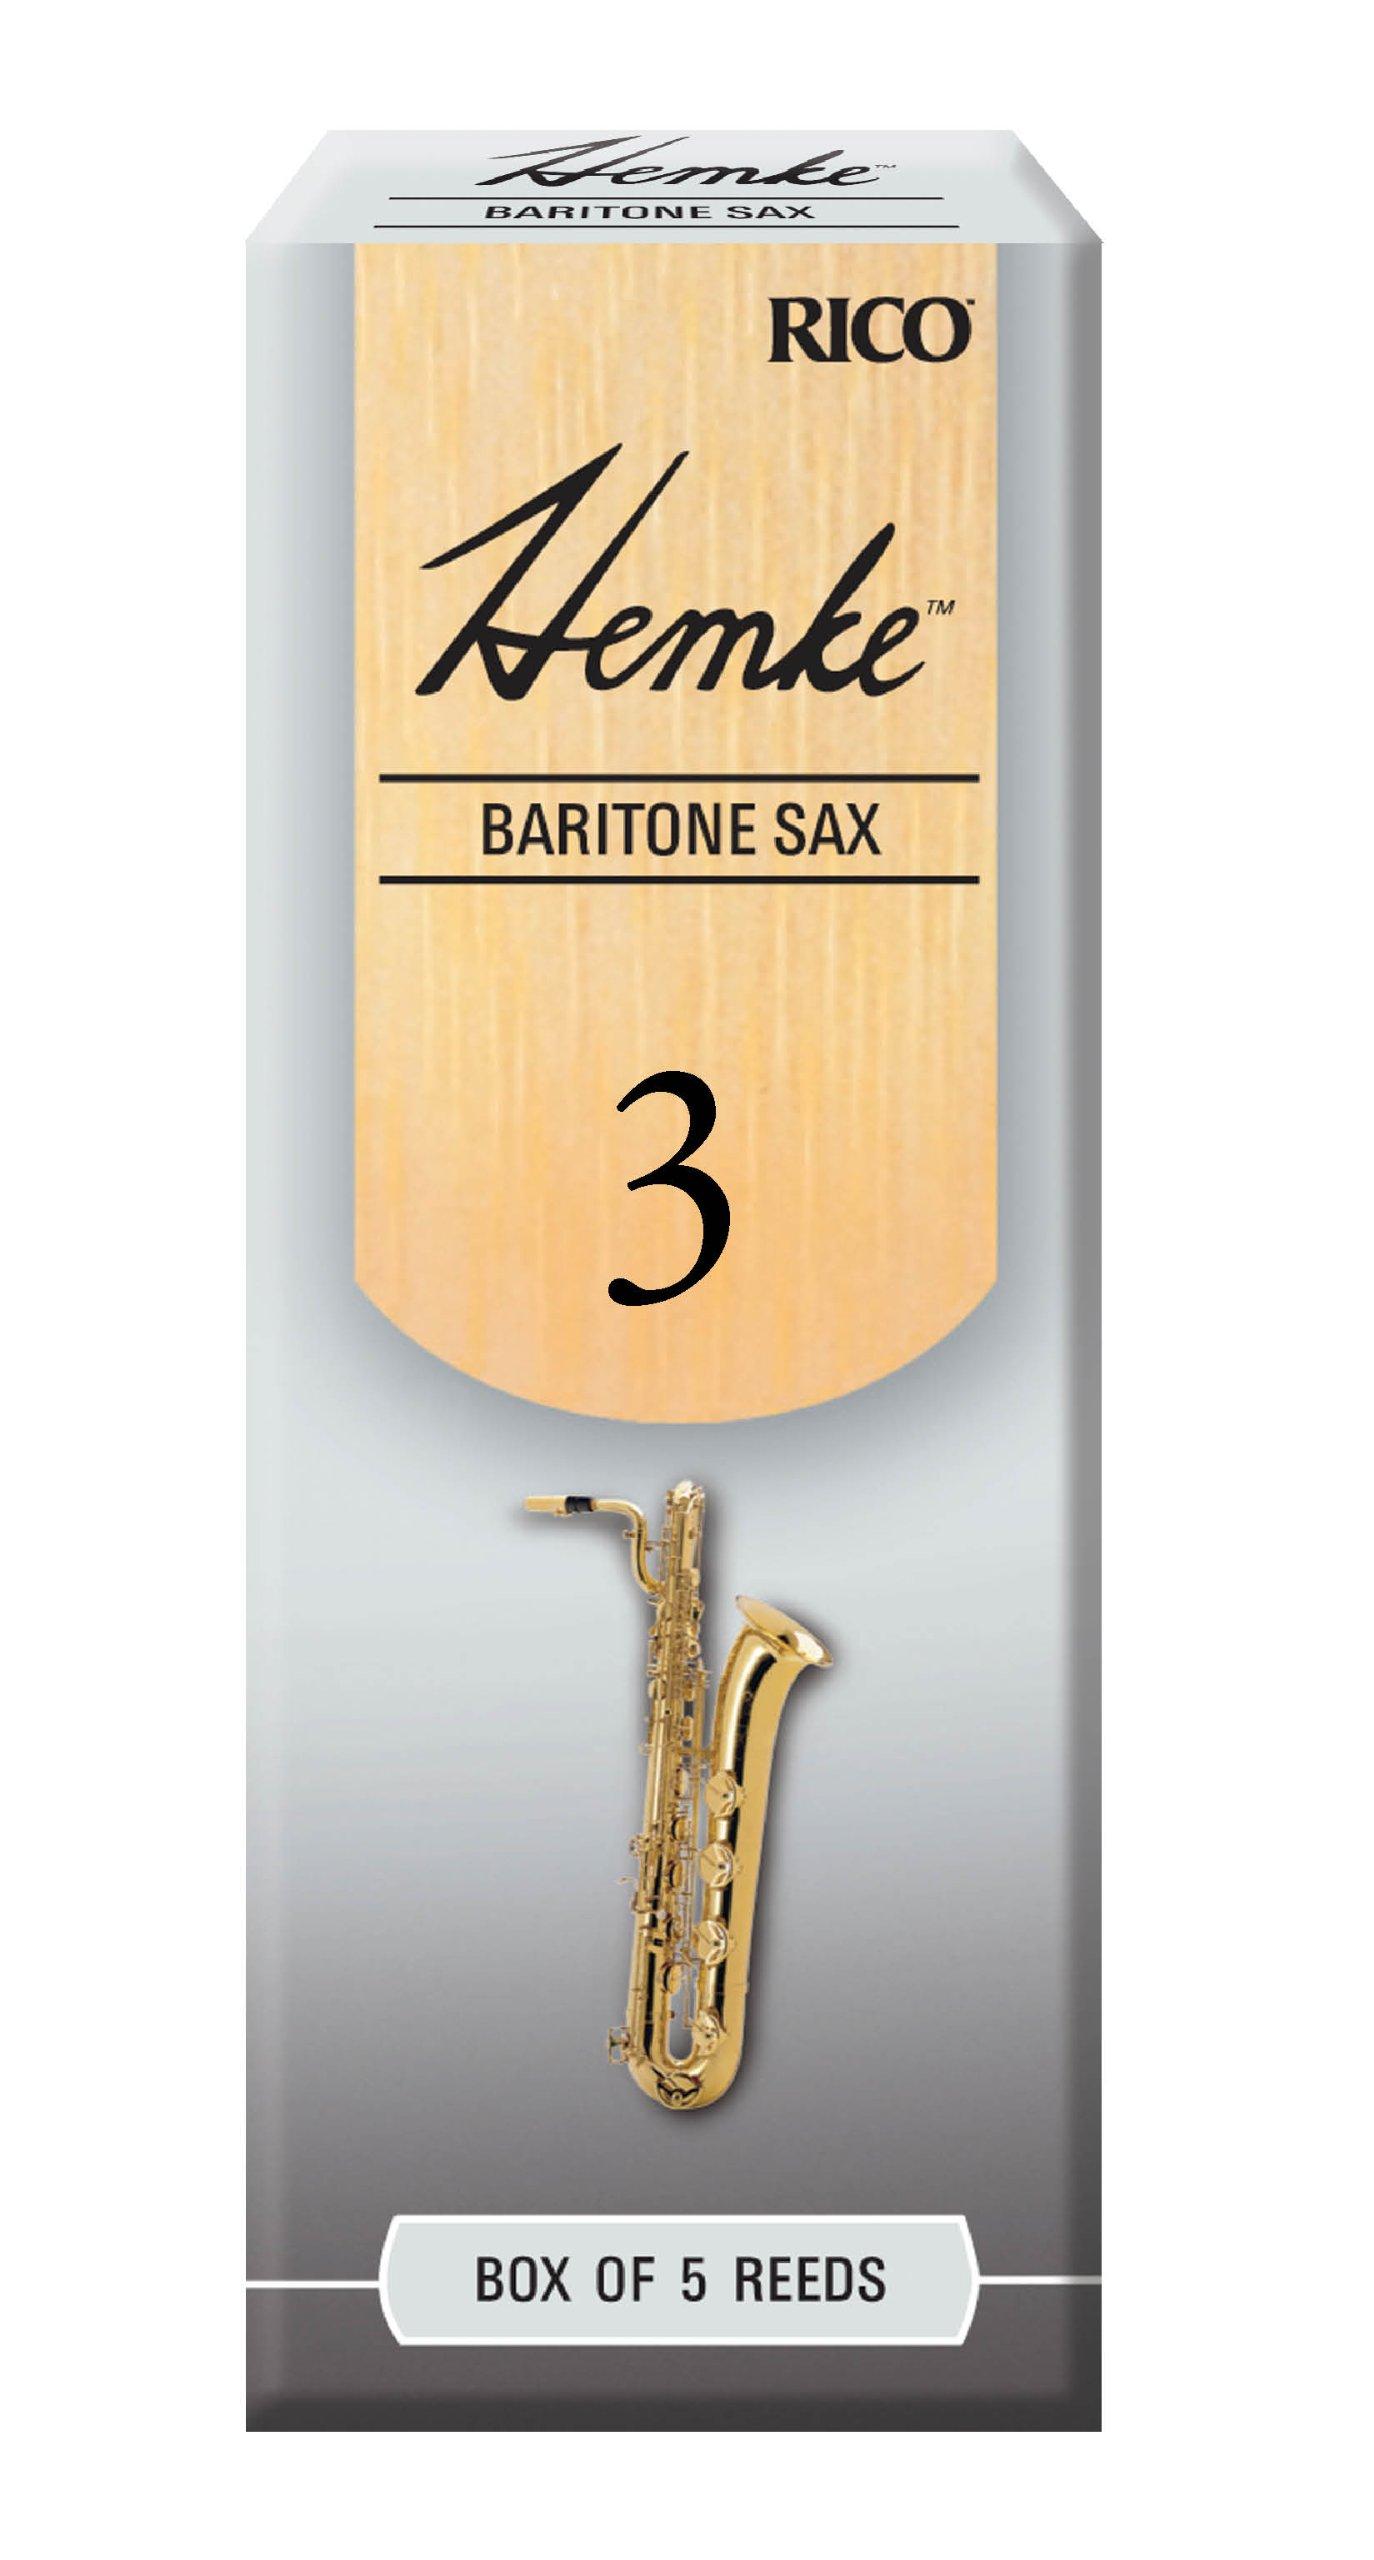 Hemke Baritone Sax Reeds, Strength 3.0, 5-pack